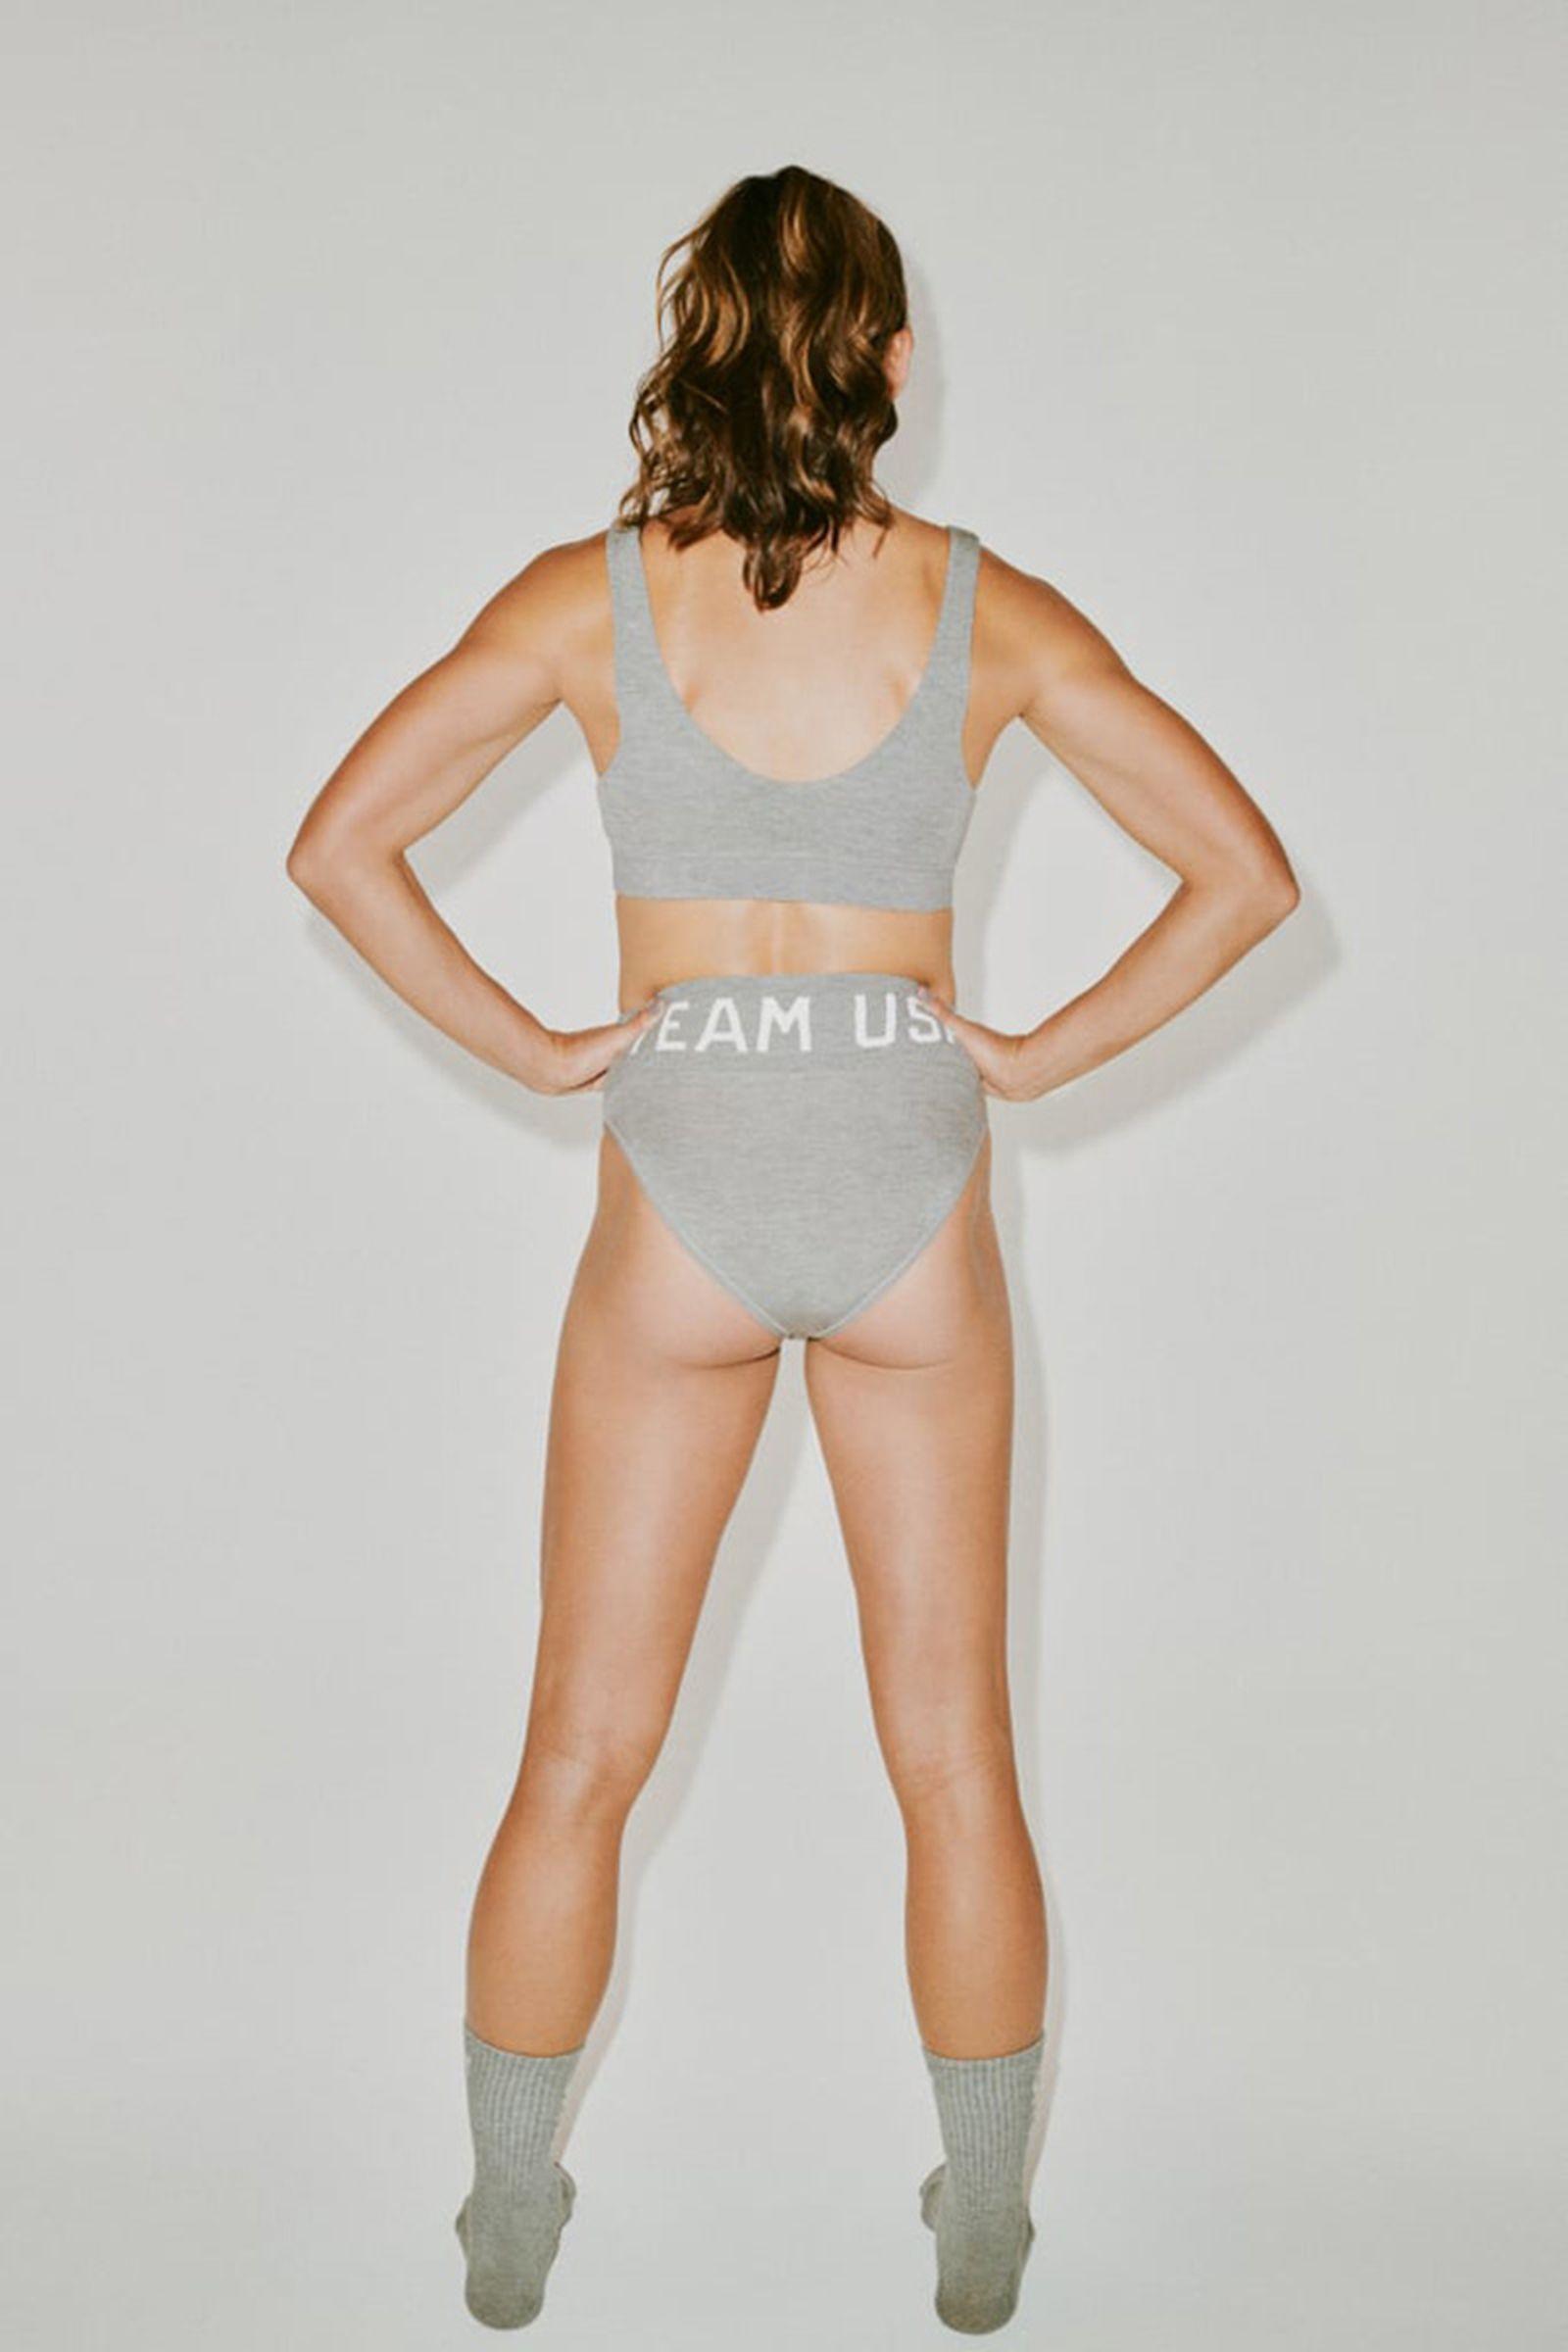 kim-kardashian-skims-tokyo-olympics-11